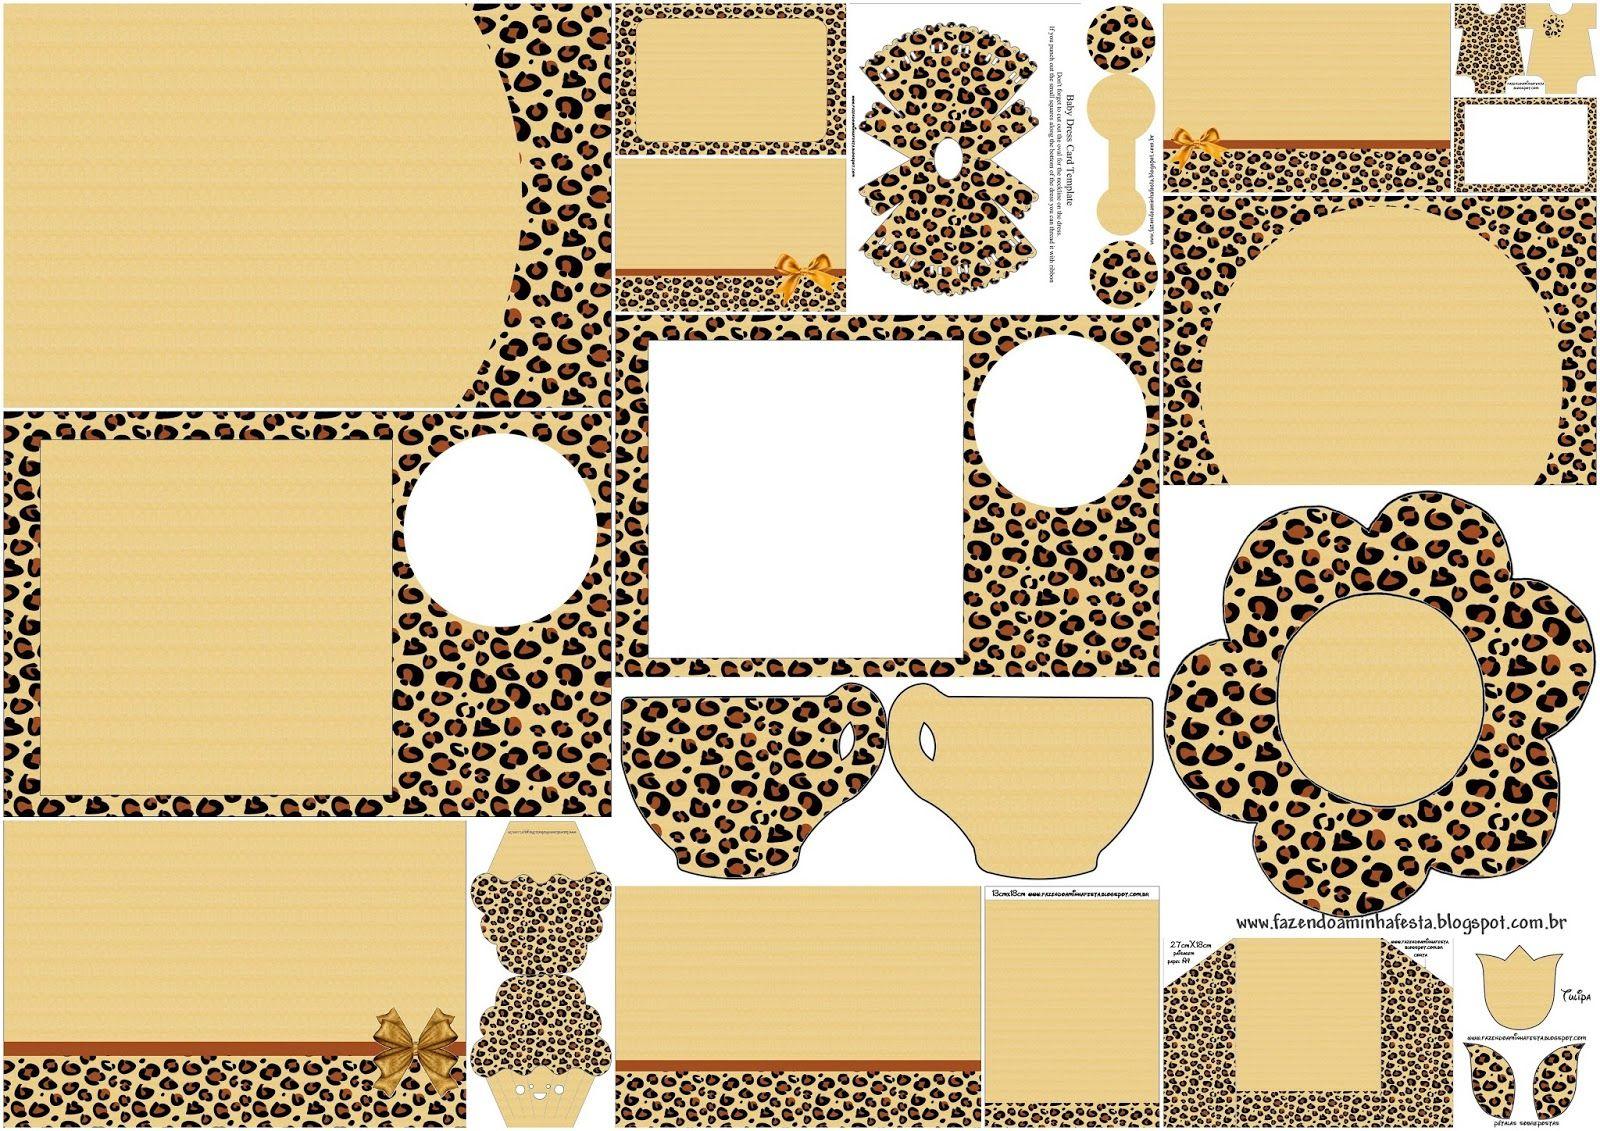 Leopard Prints: Free Printable Invitation. | Birthday Party Ideas - Free Printable Animal Print Birthday Invitations